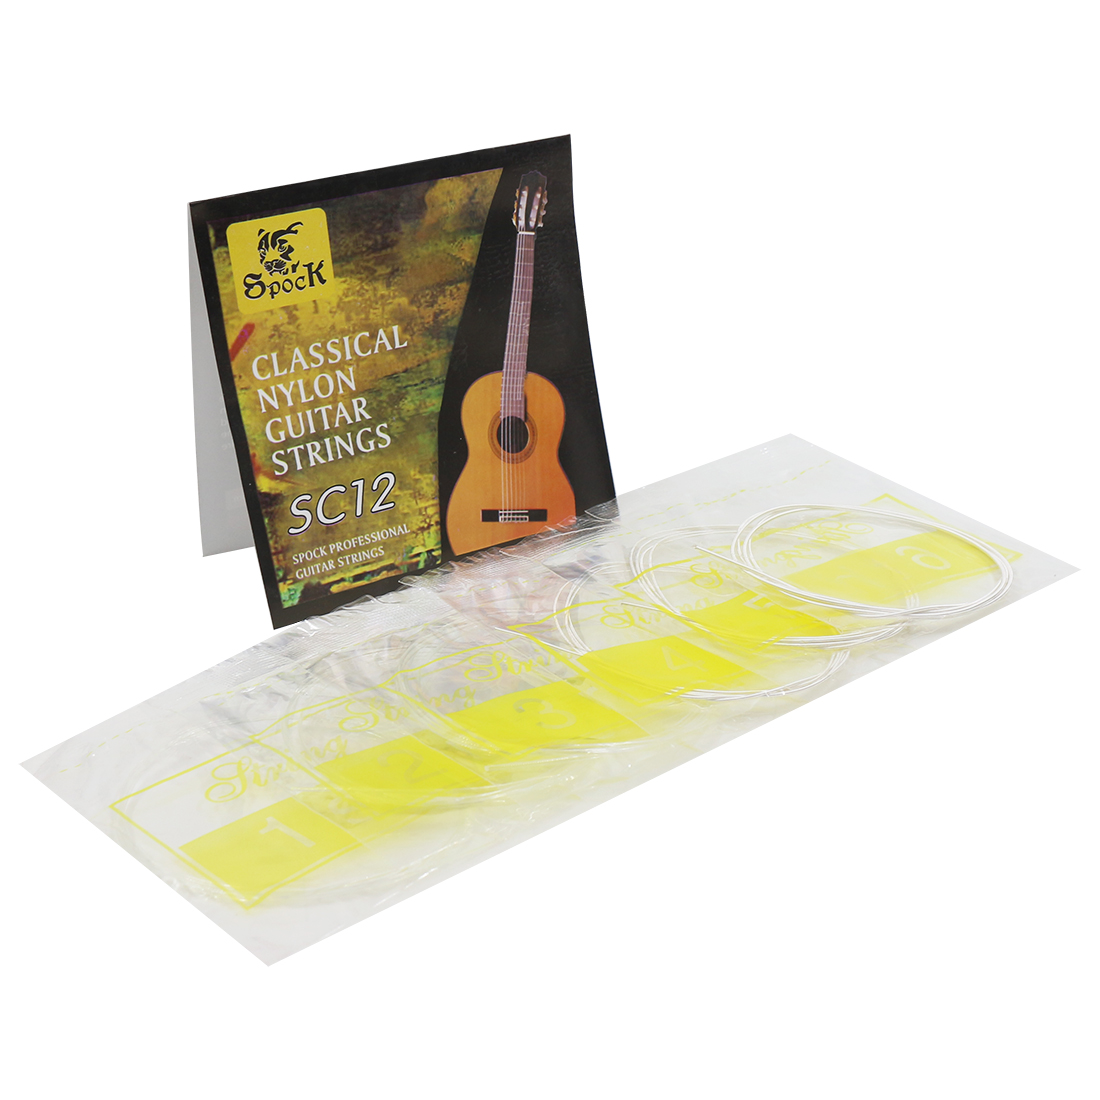 6 pcs Guitar Strings Set Nylon Silver Plating Super Light for Classic Acoustic Guitar  SC12